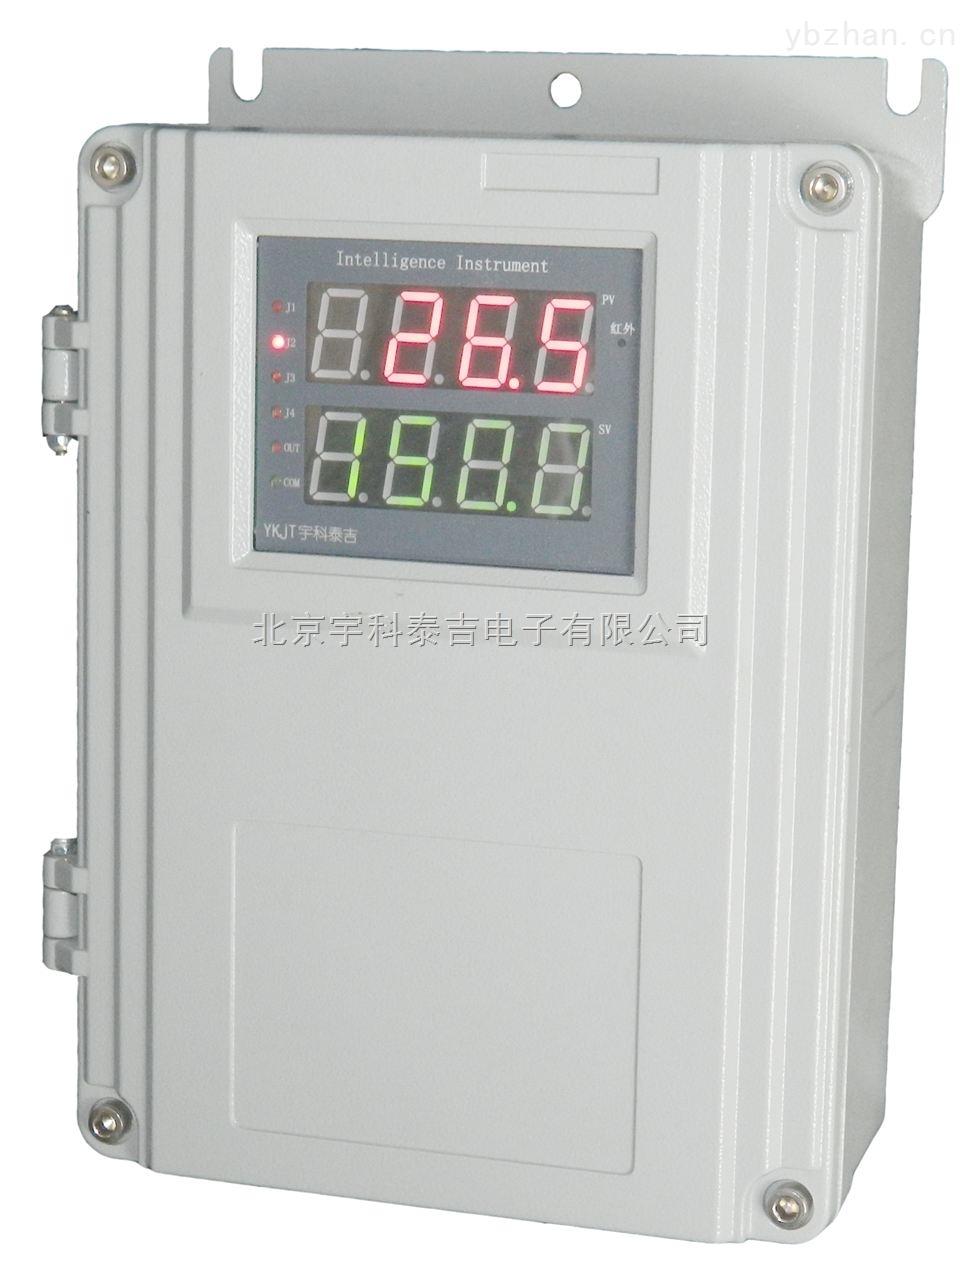 YK-11MFB-智能高精度防爆數顯測控儀